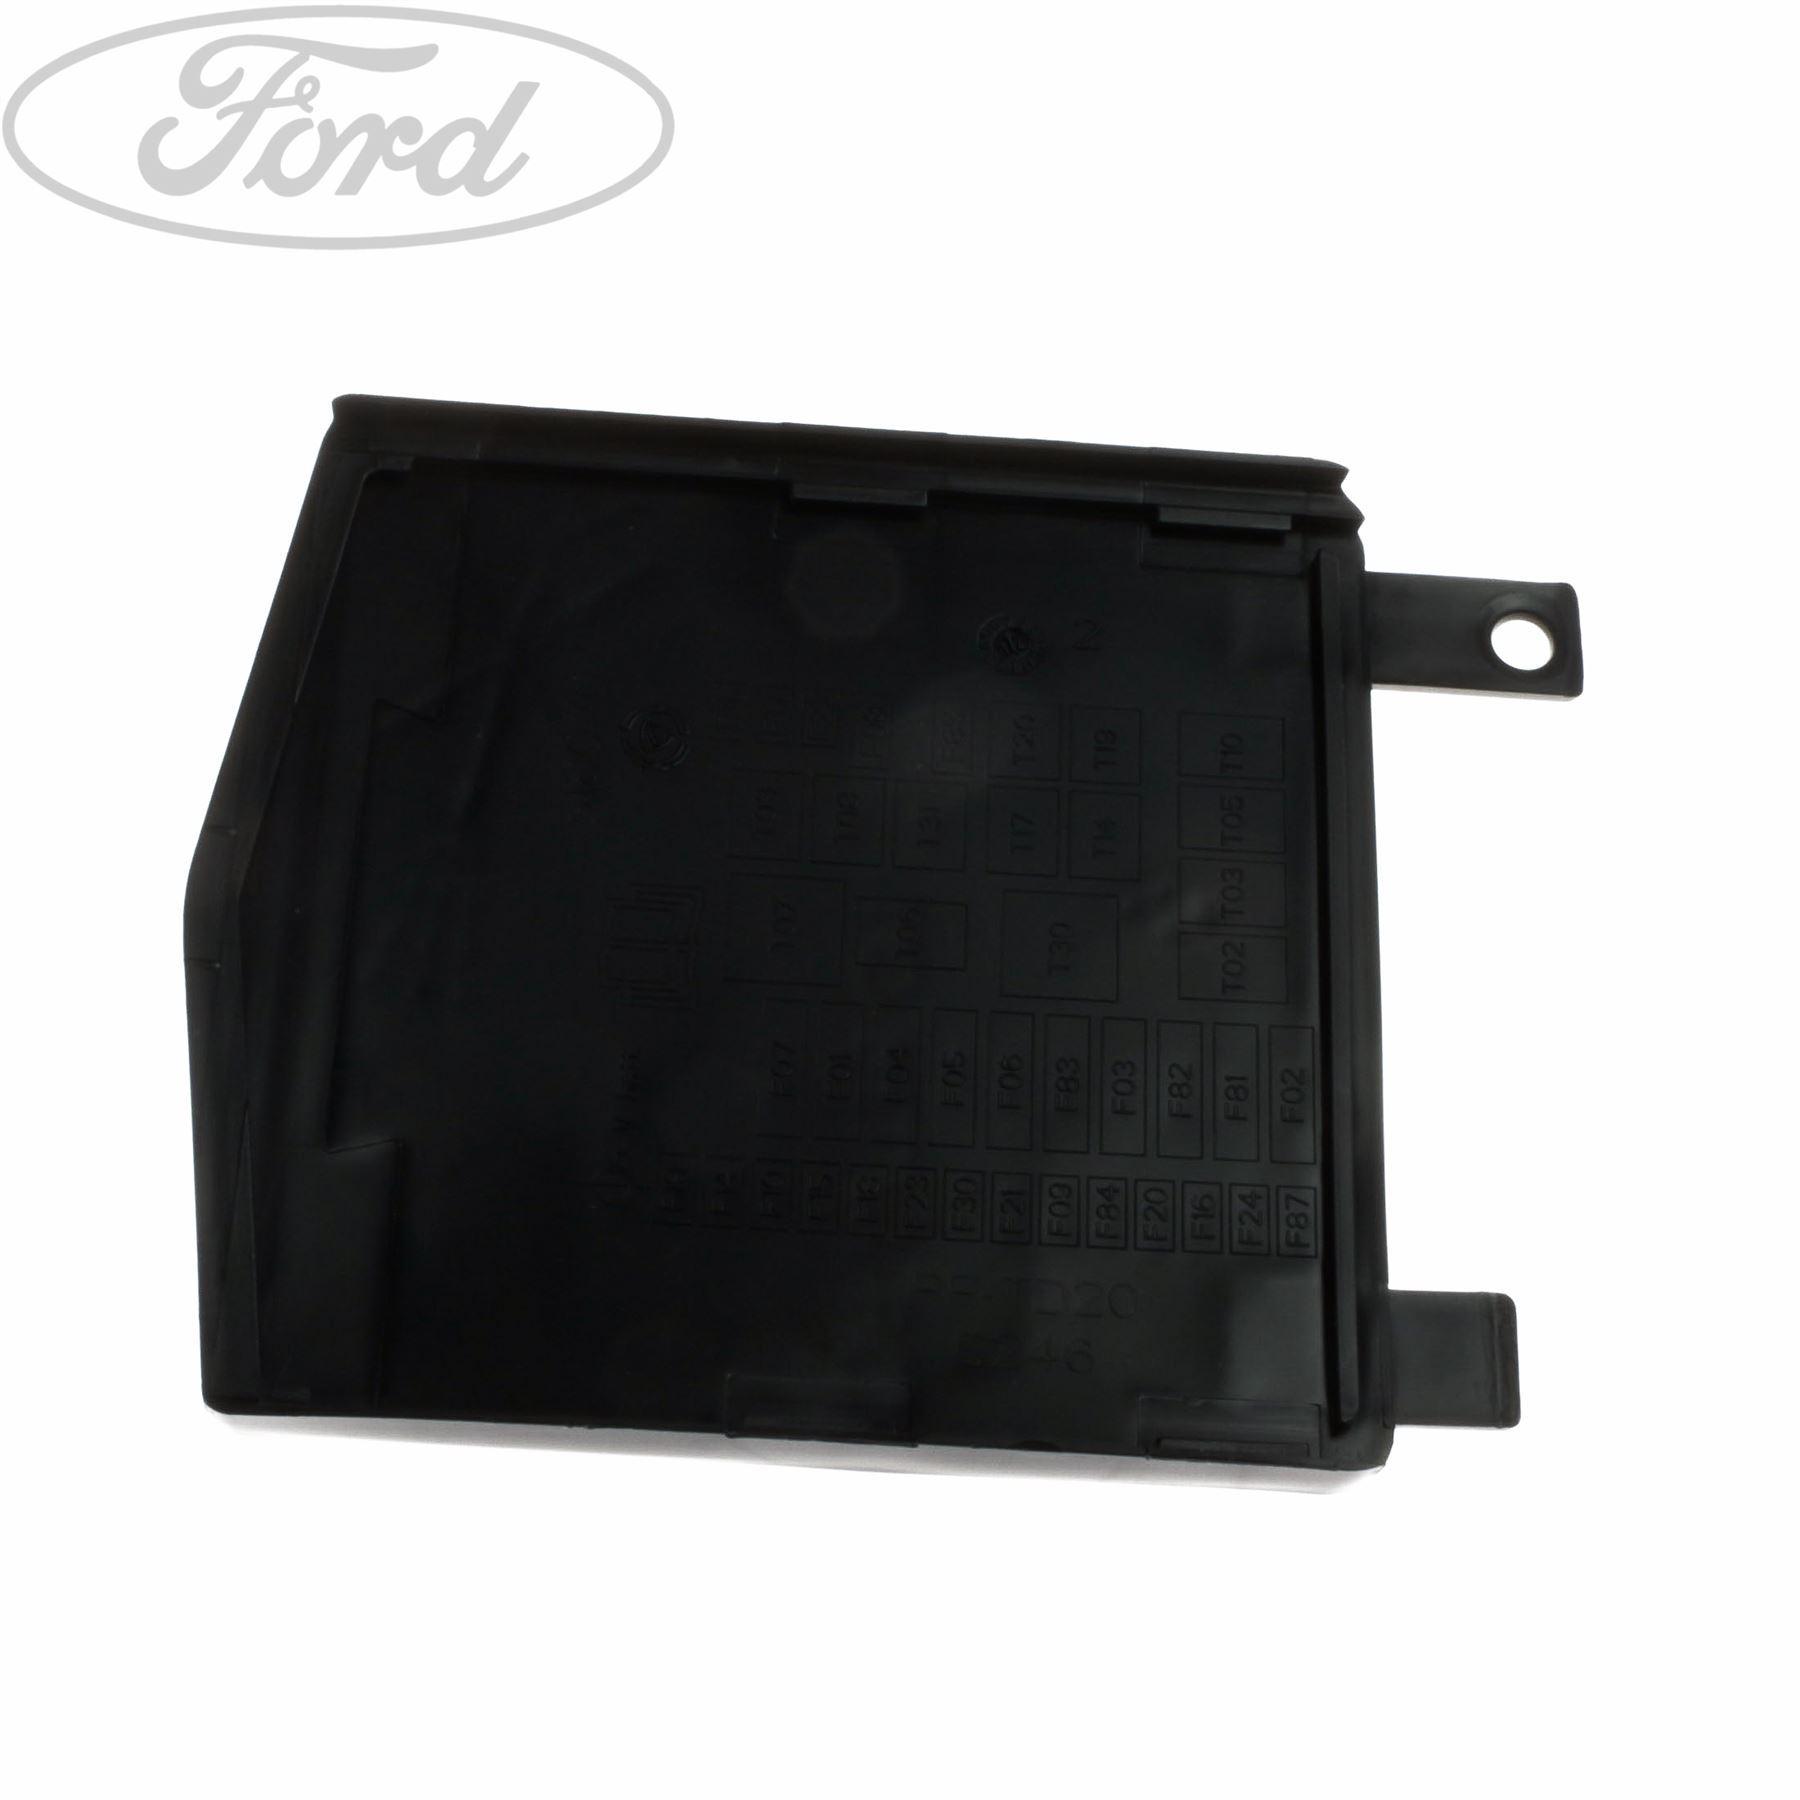 Genuine Ford Ka Additional Fuse Box Cover 1633886 Ebay Location